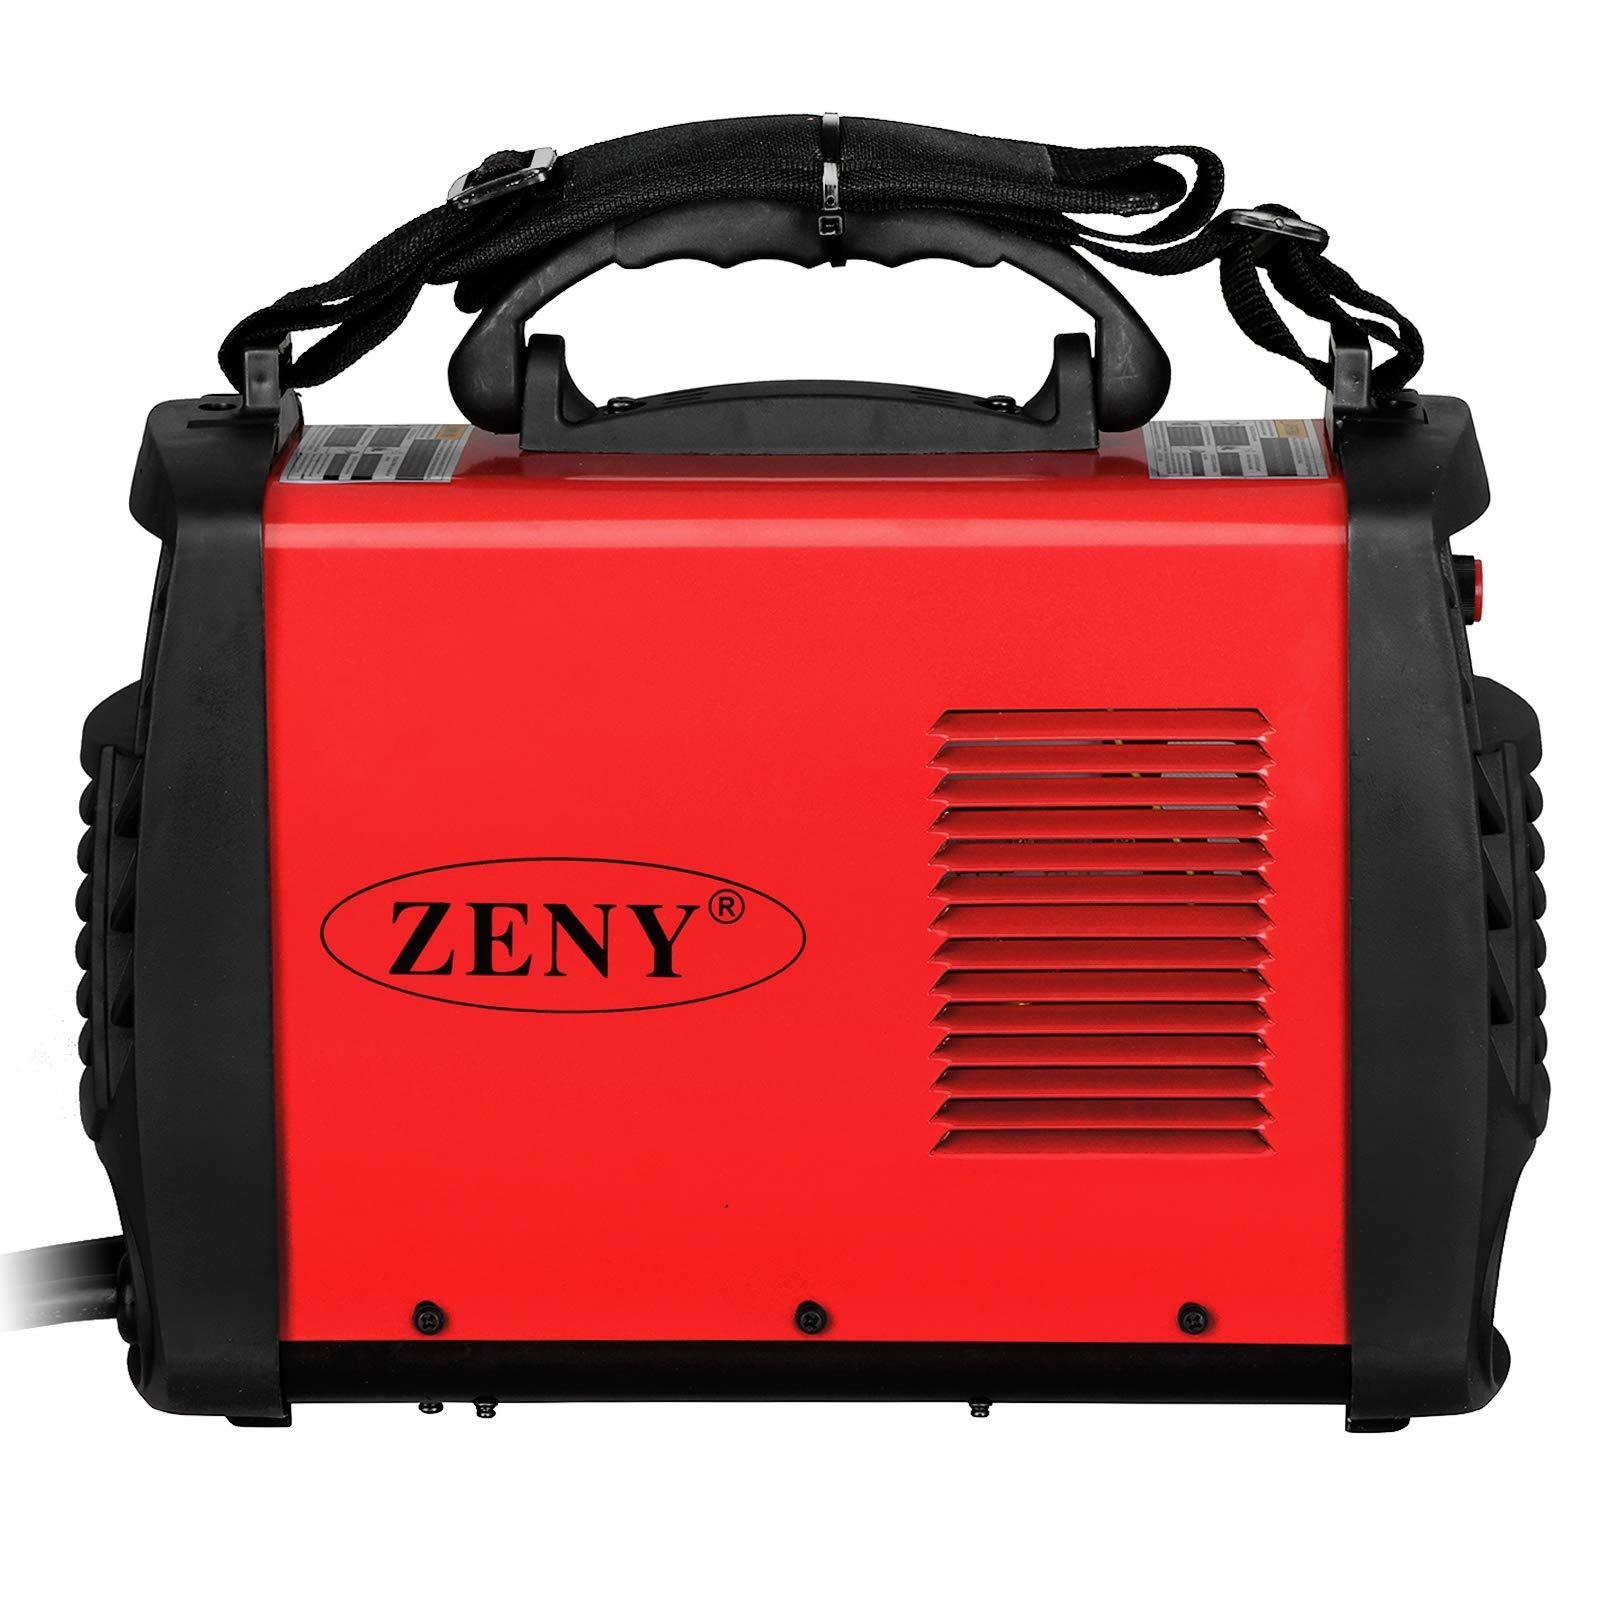 ZENY Arc Welding Machine DC Inverter Handheld Welder MMA 20-160A IGBT 110V/230V Dual Voltage IGBT Stick by ZENY (Image #5)